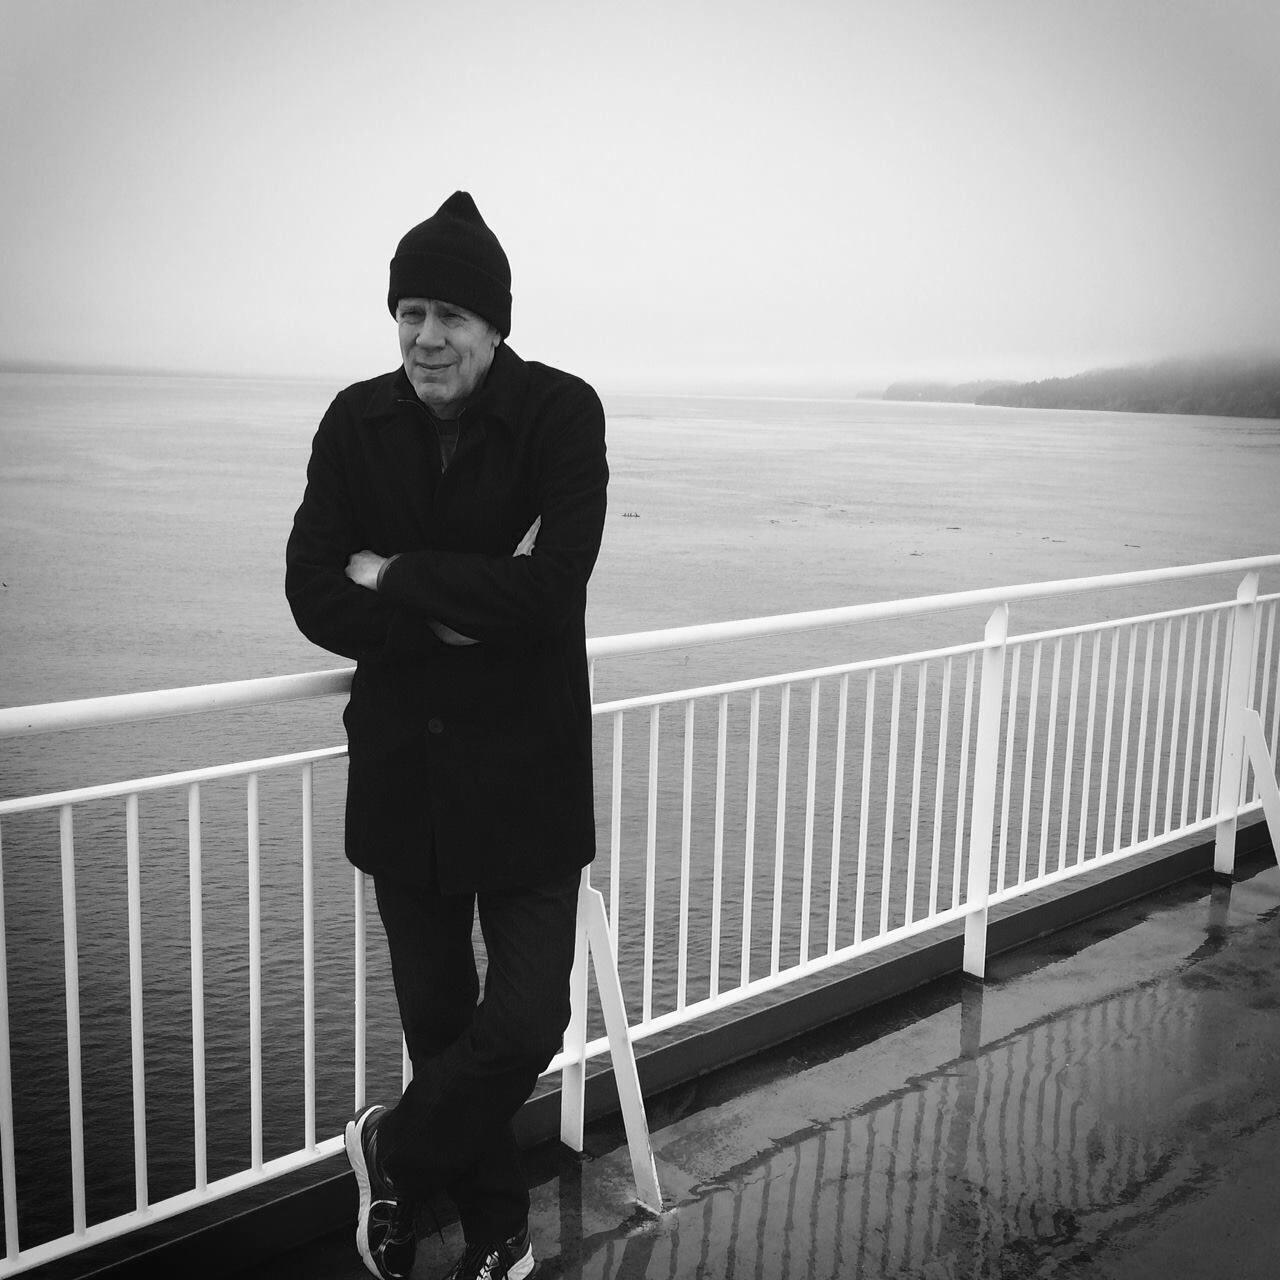 BC_ferry.jpg